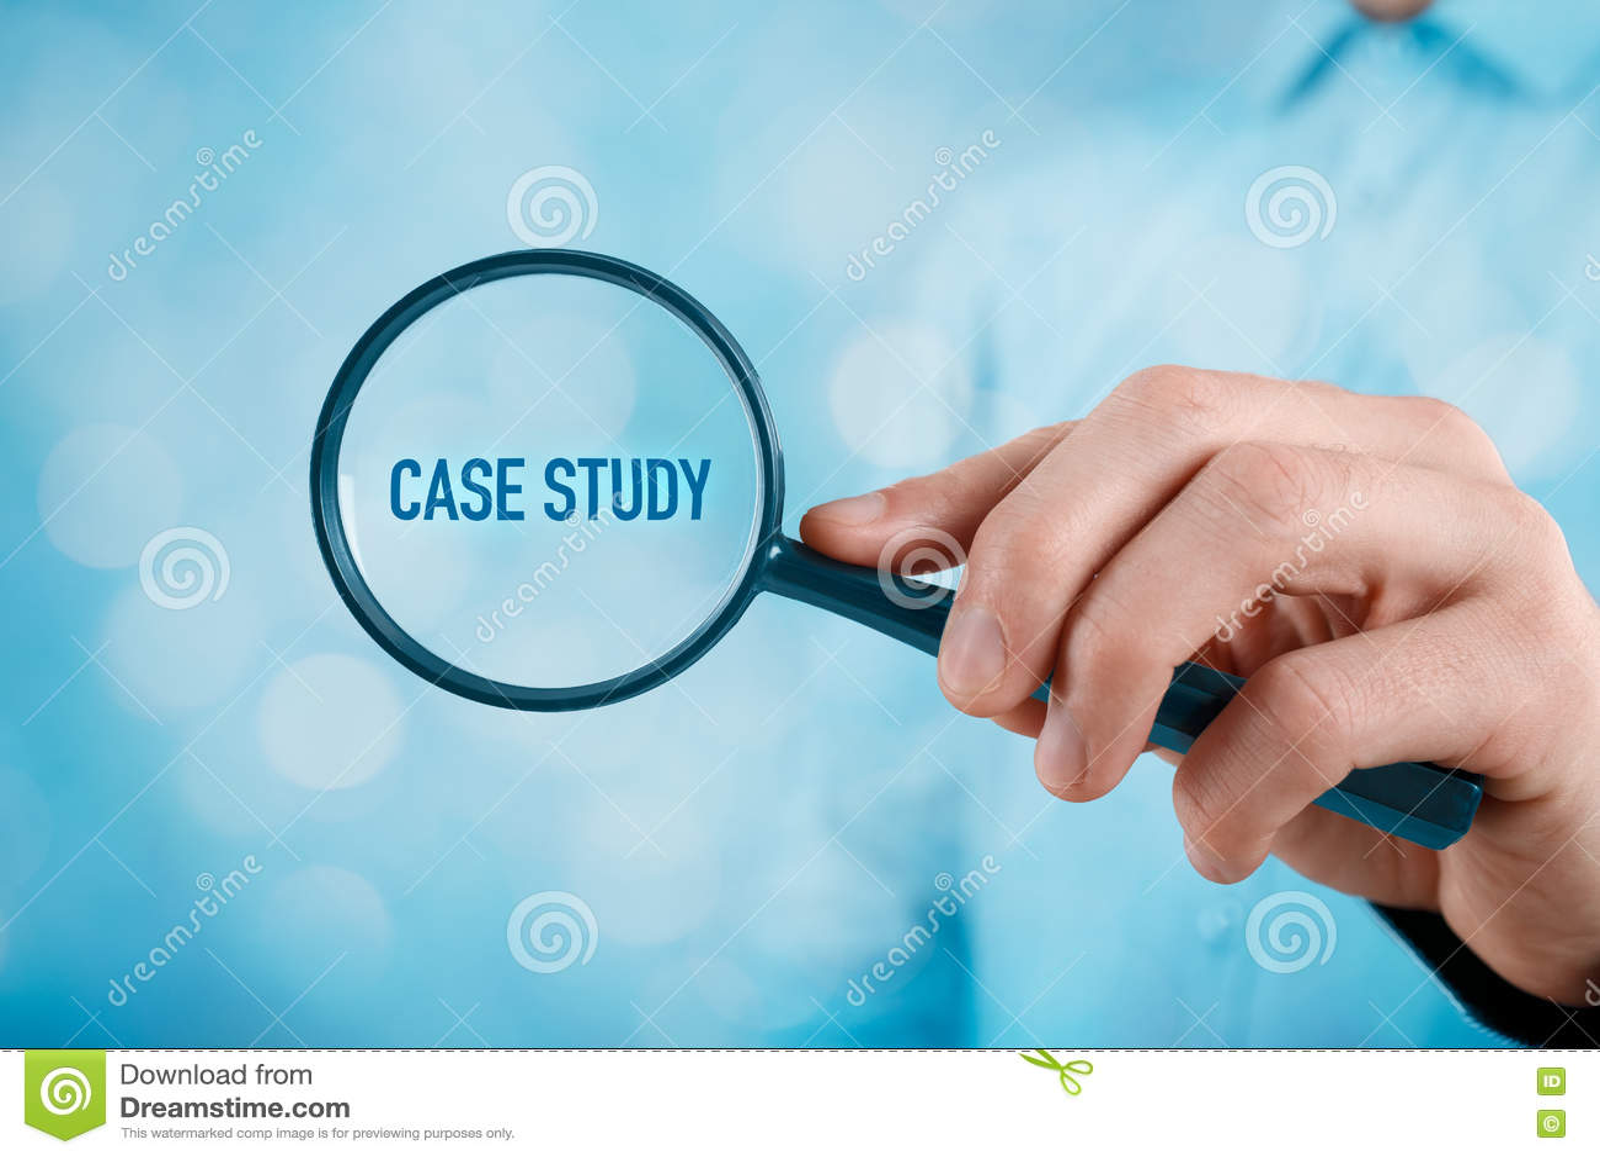 Stock case analysis